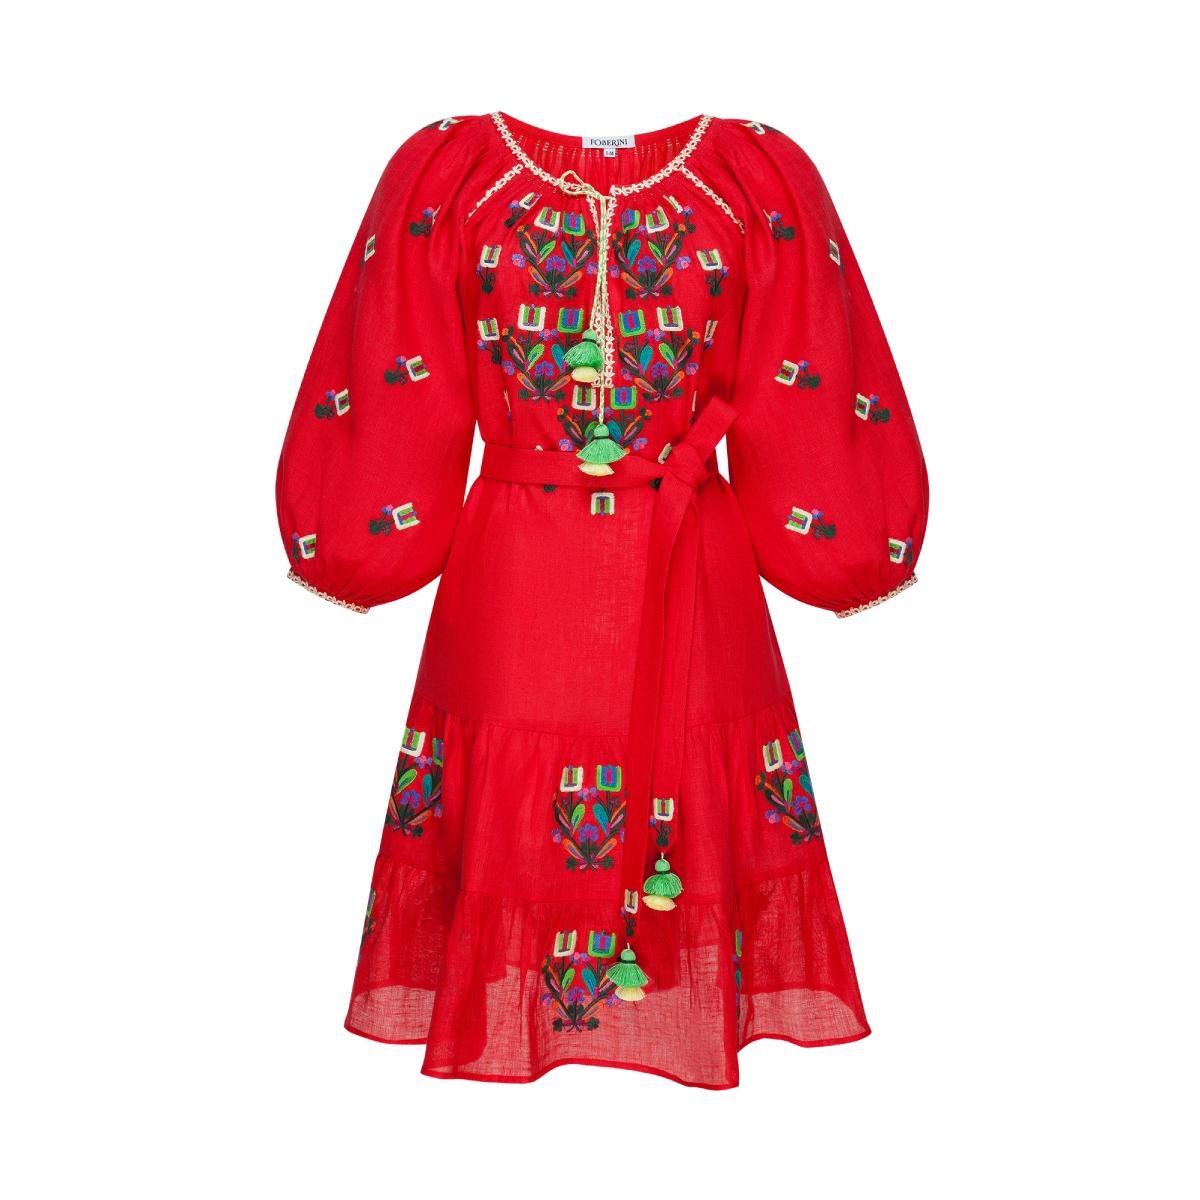 Omelia Chic Red Mini Dress